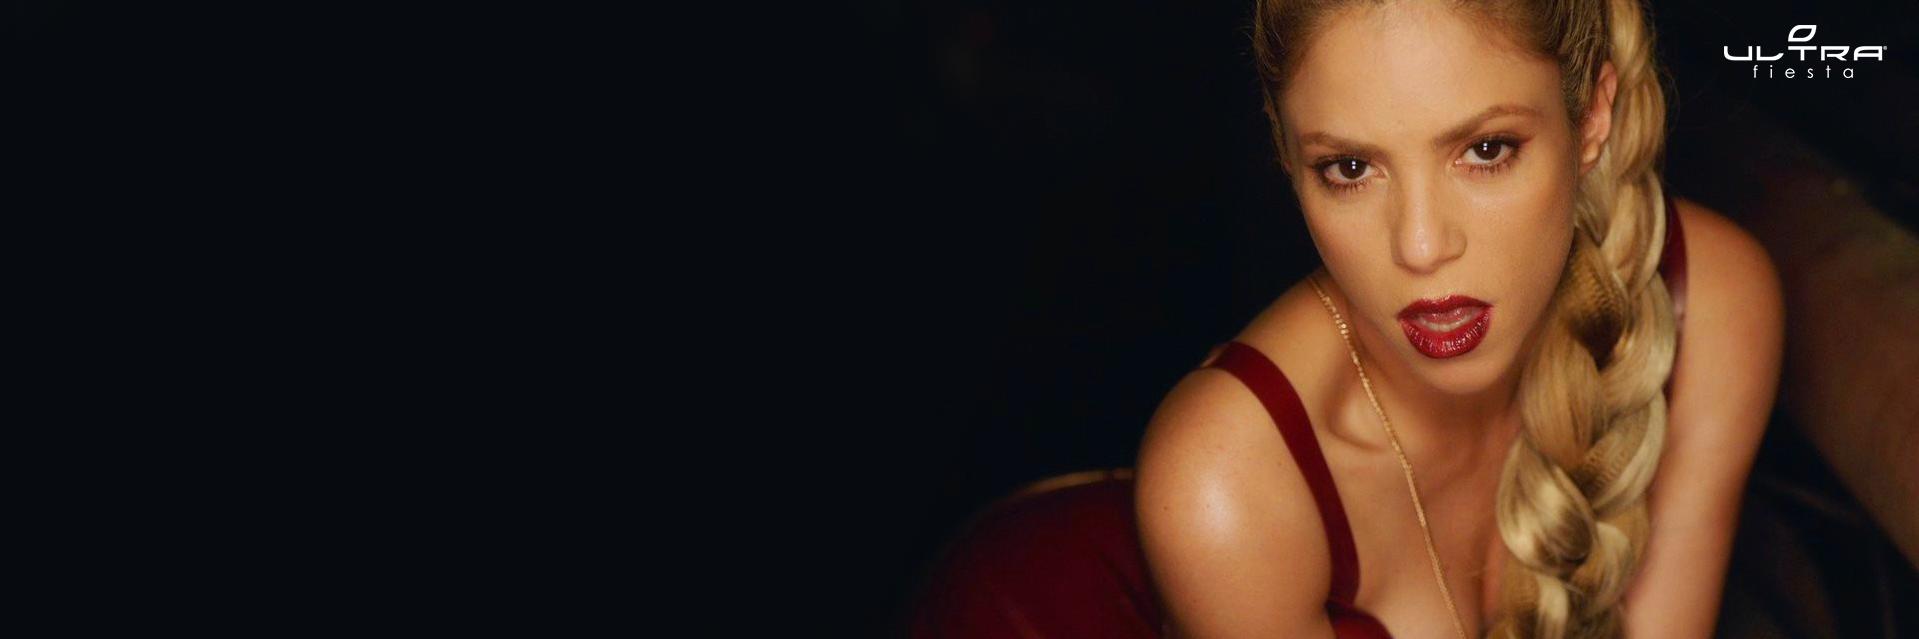 Shakira | Ultra Fiesta